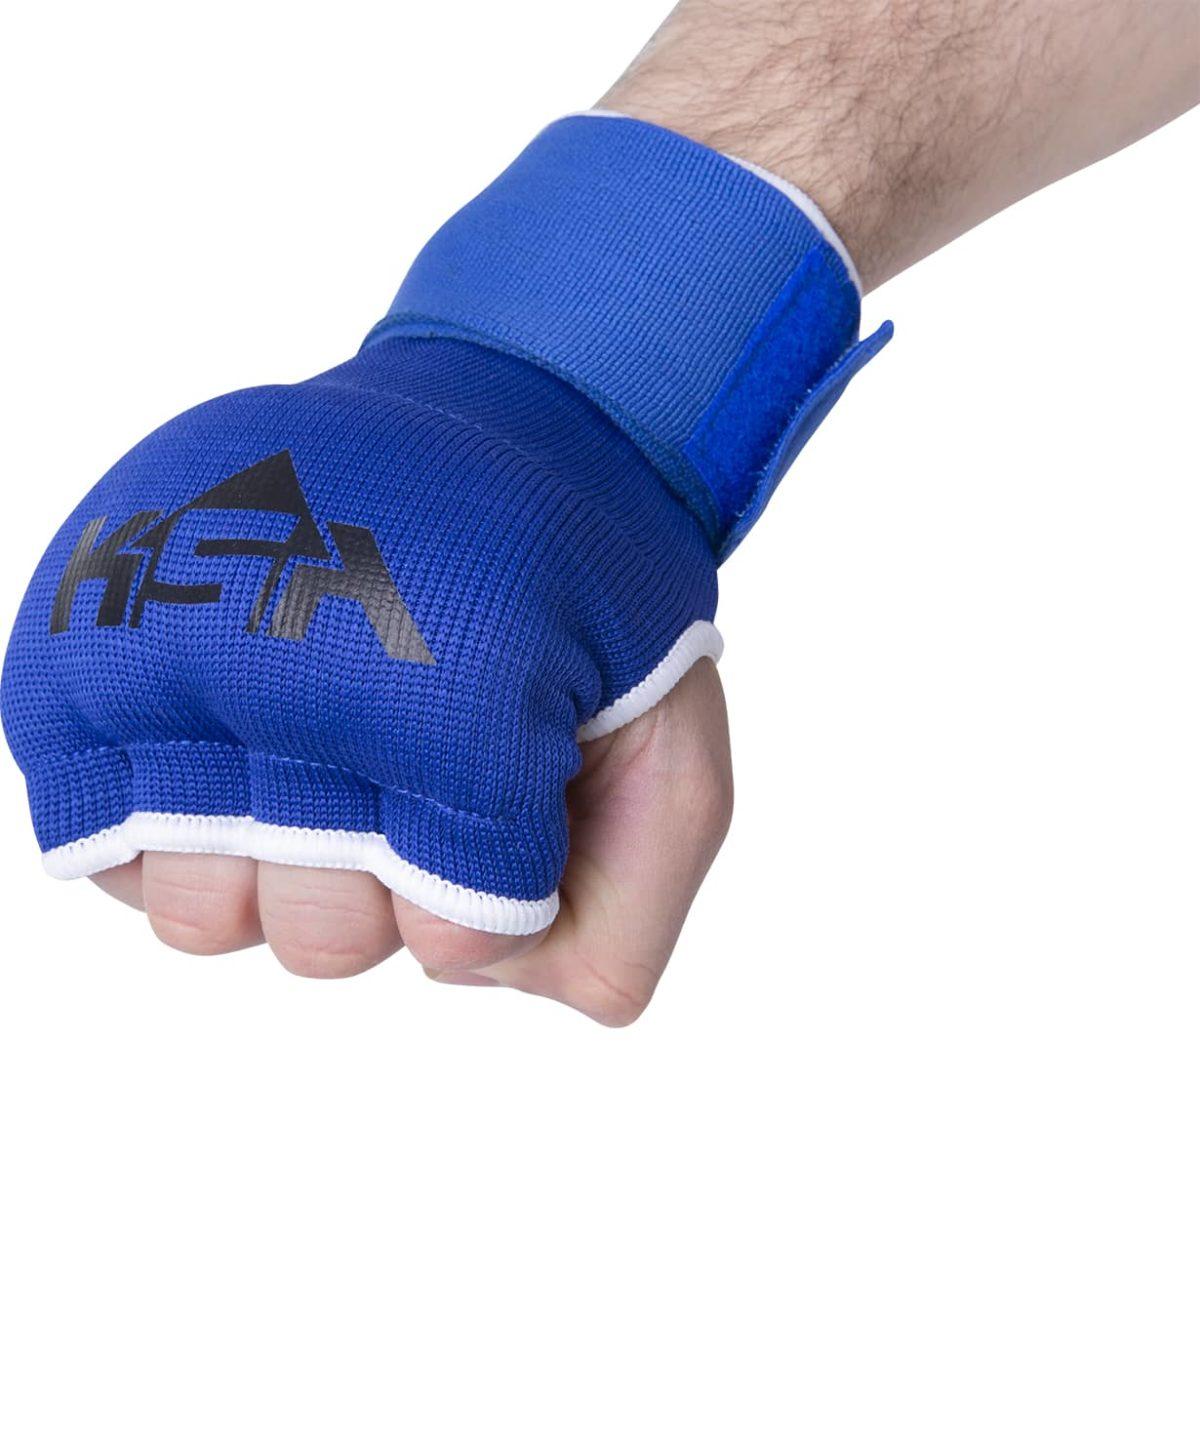 KSA Cobra Blue Перчатки внутренние для бокса 17902: синий - 3